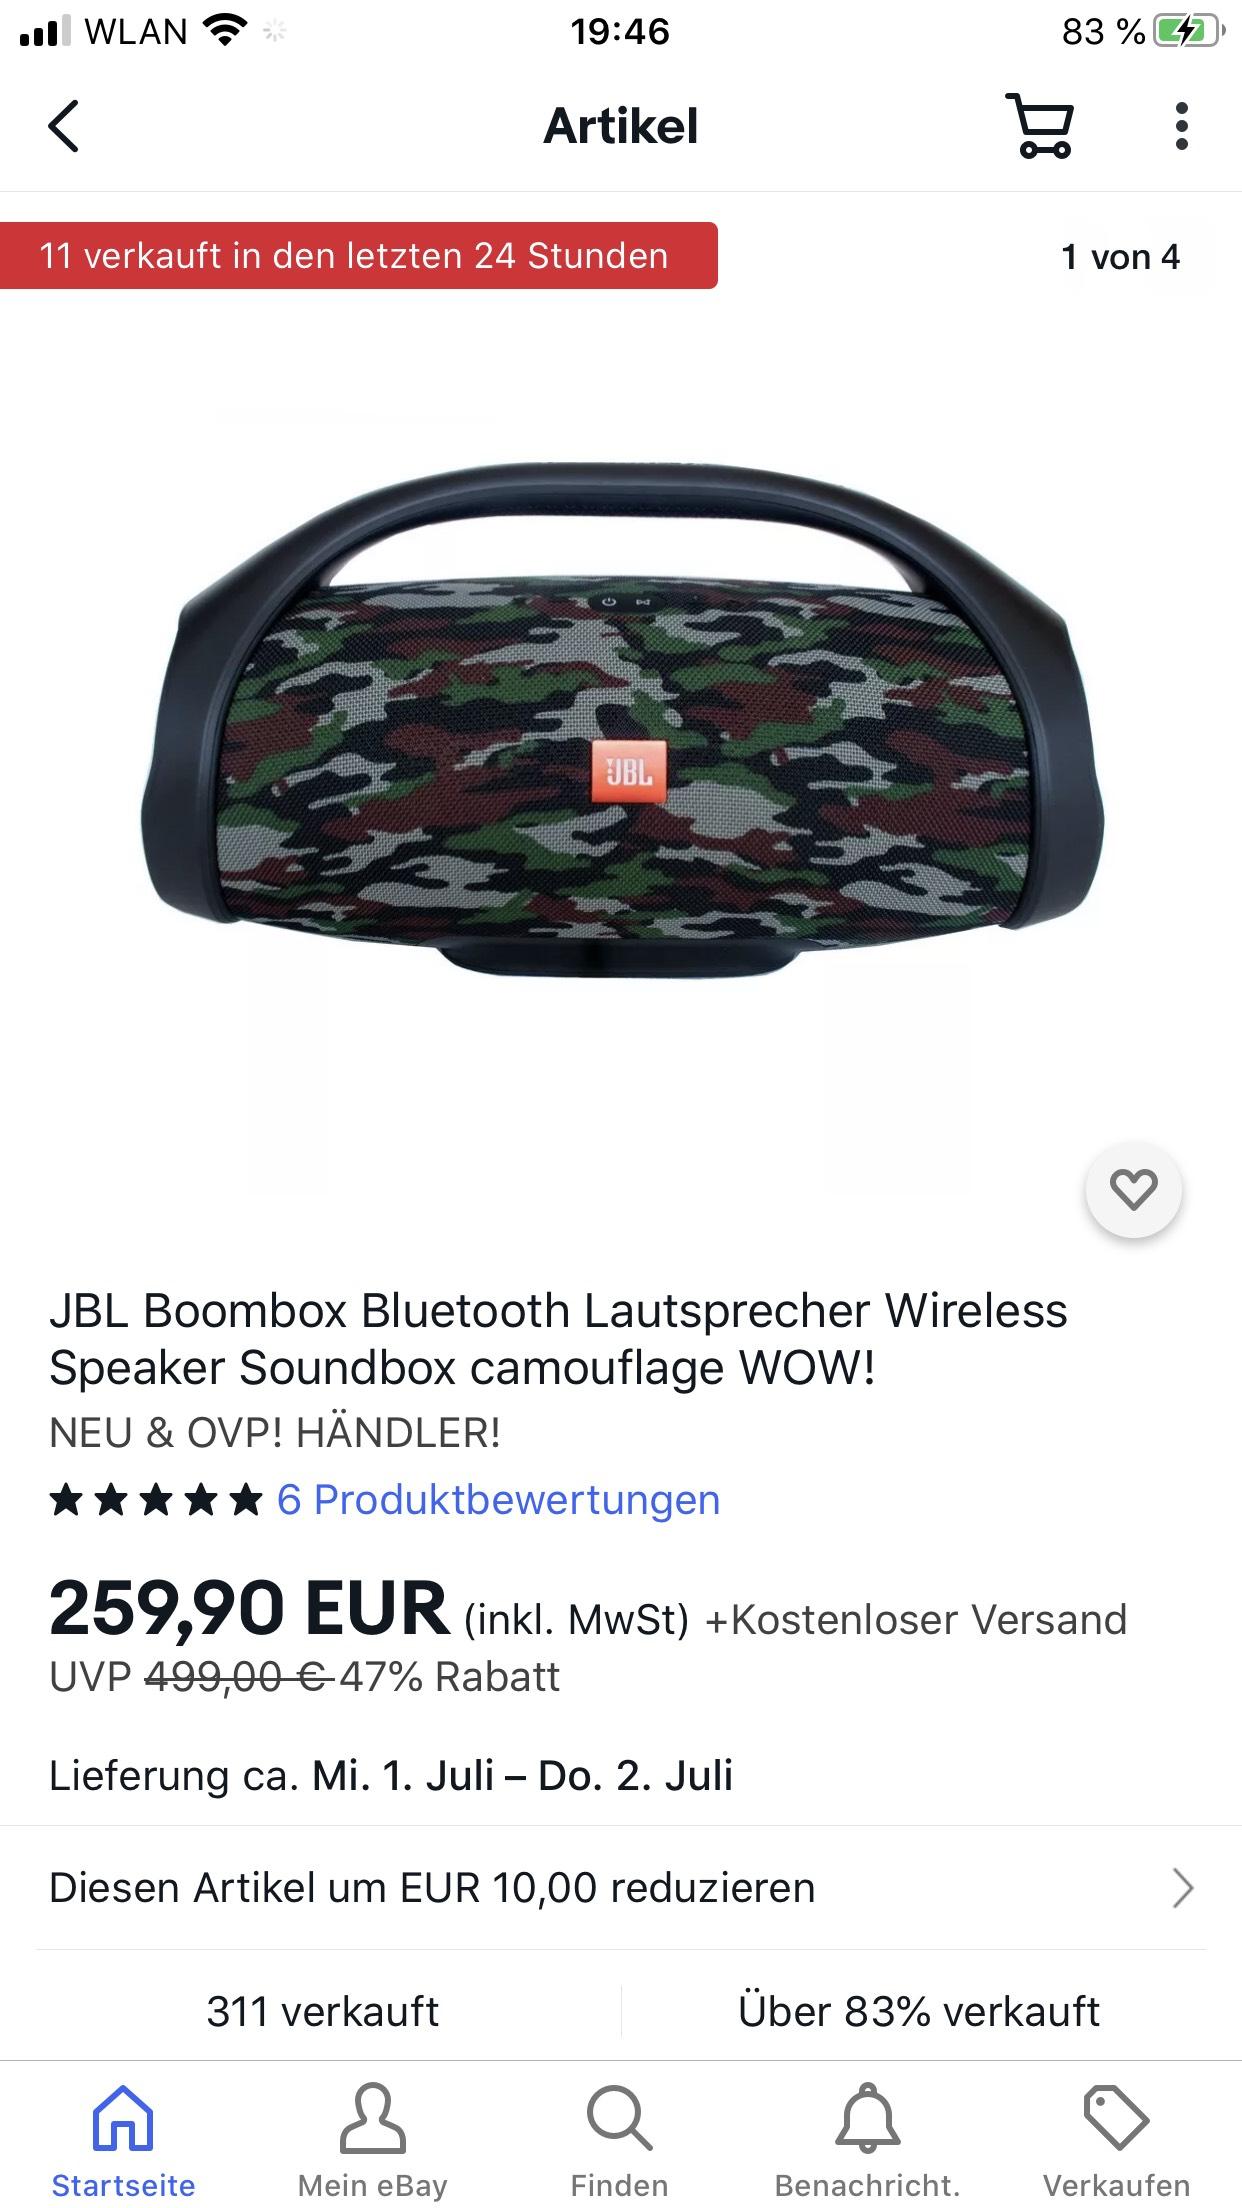 JBL Boombox Bluetooth Lautsprecher Wireless Speaker Soundbox camouflage WOW! NEU & OVP! HÄNDLER!